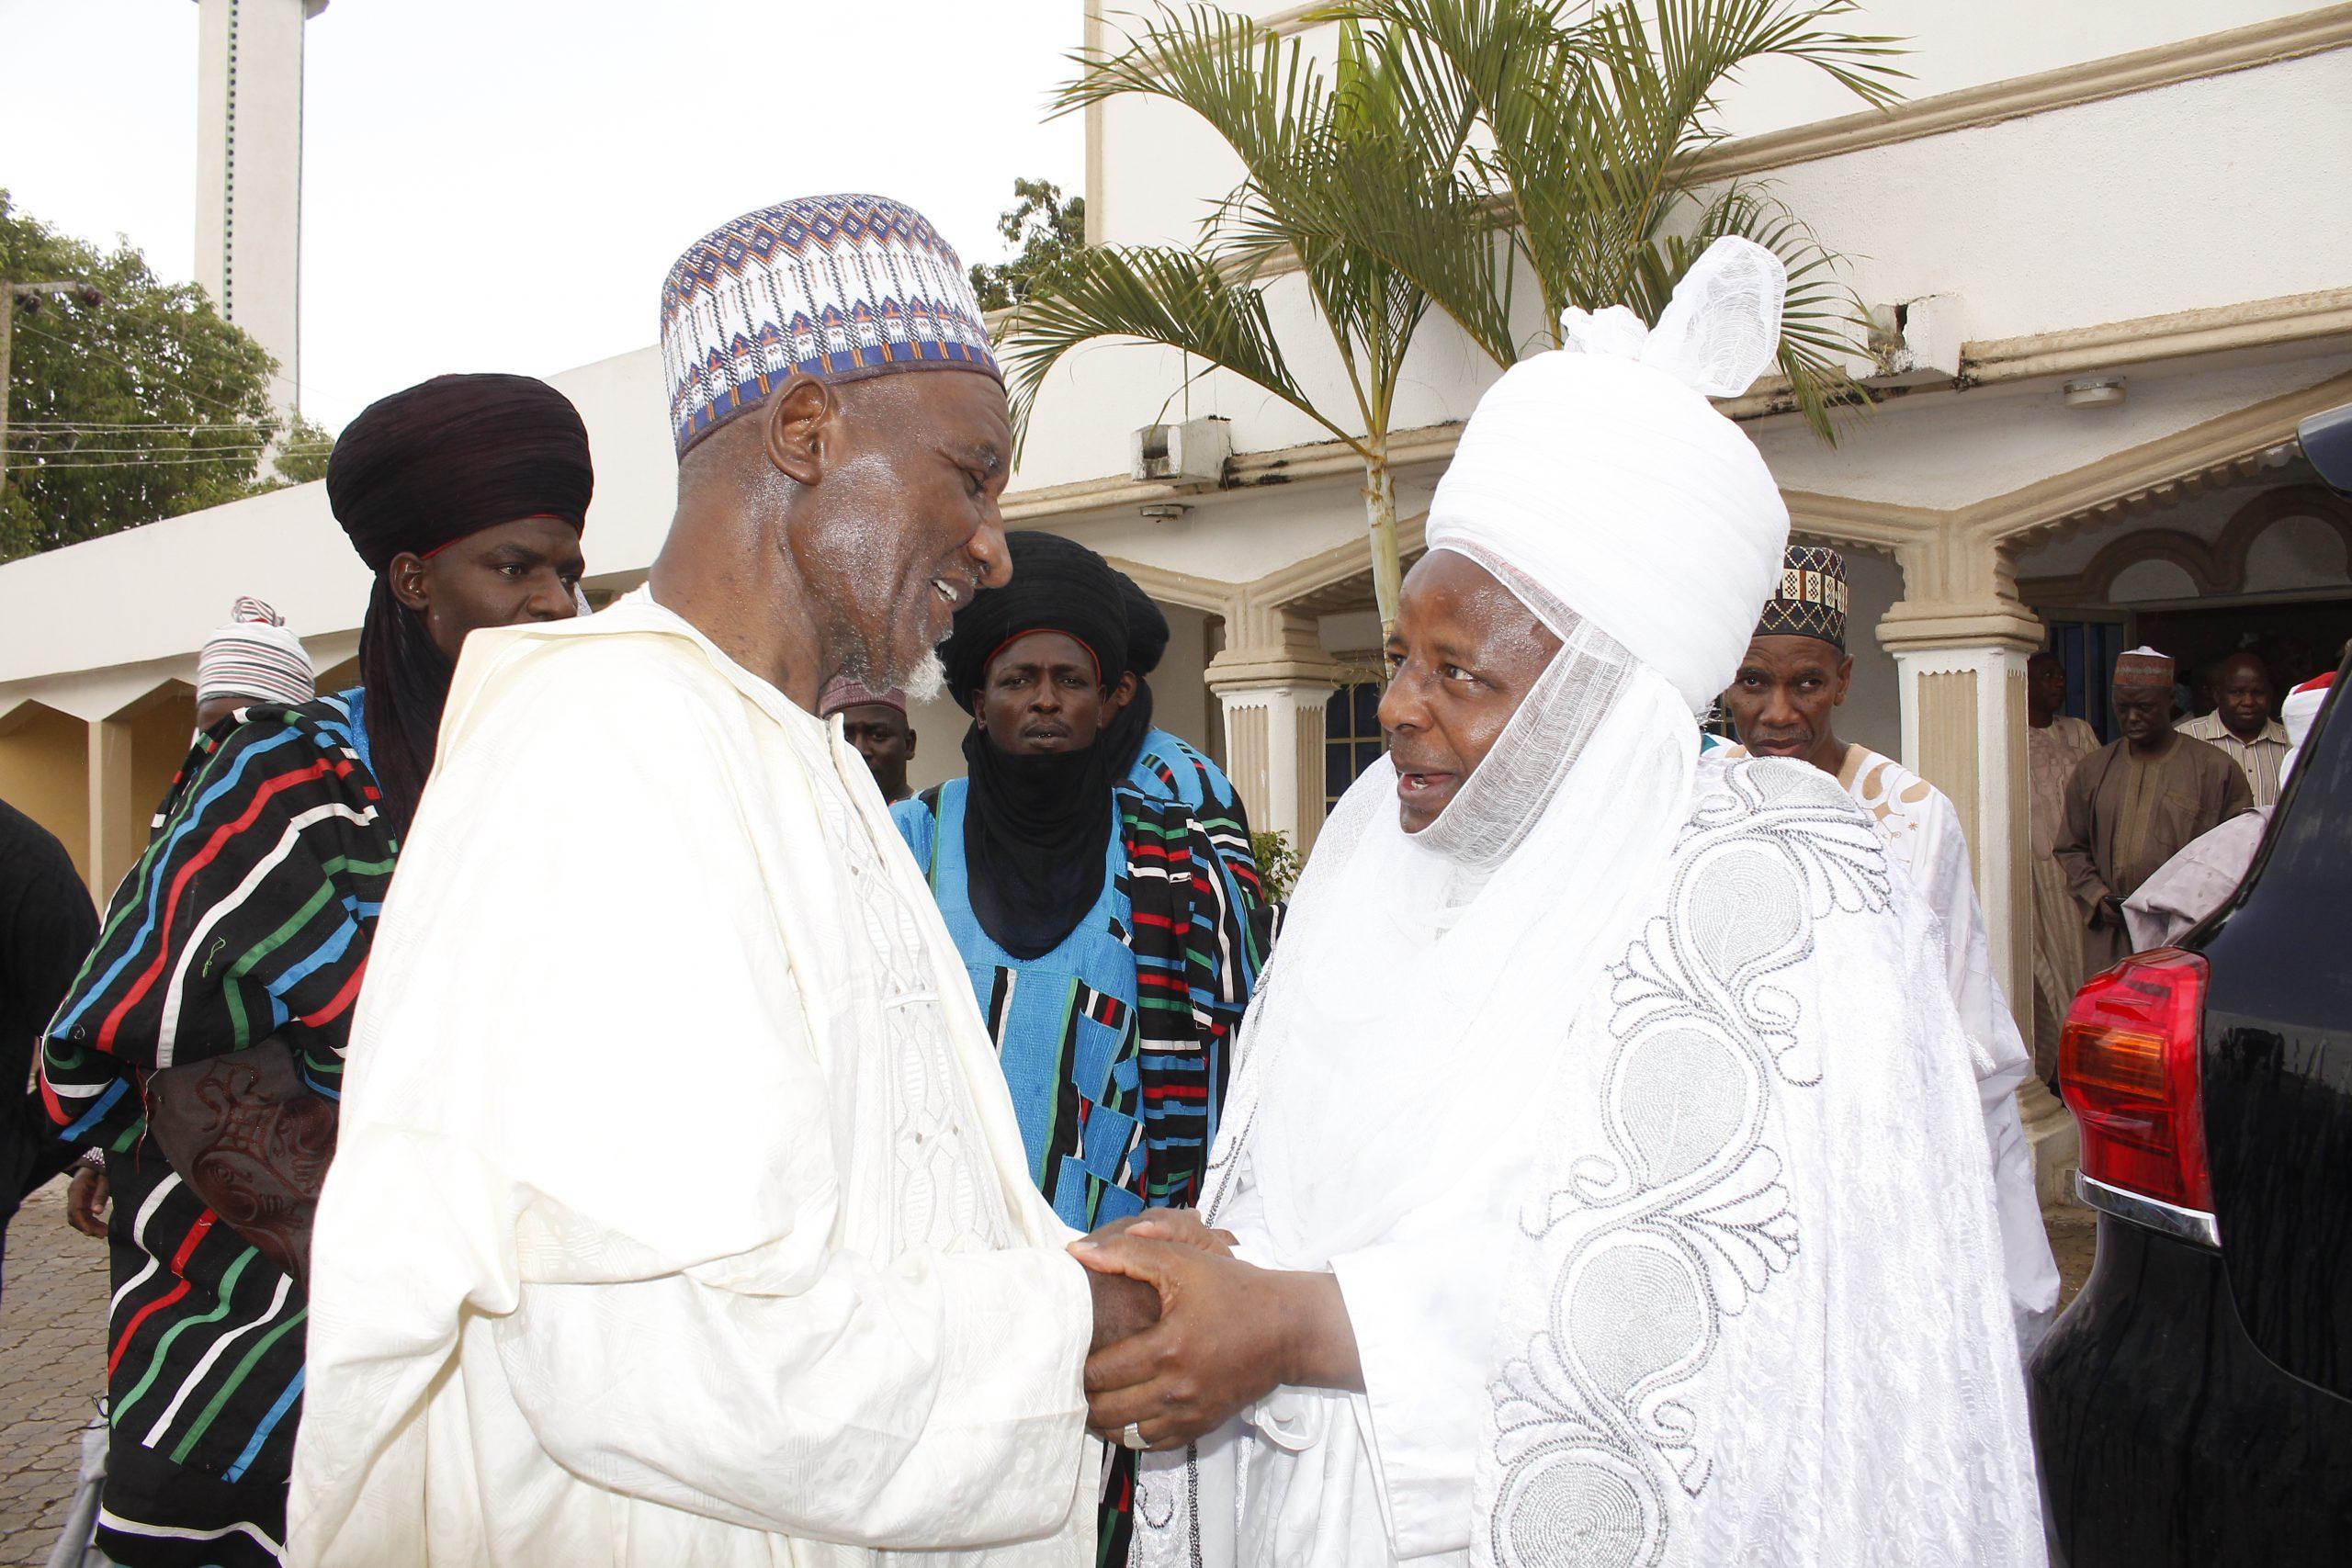 Chancellor of ADSU Mubi Paid Courtesy Visit to Emir of Mubi